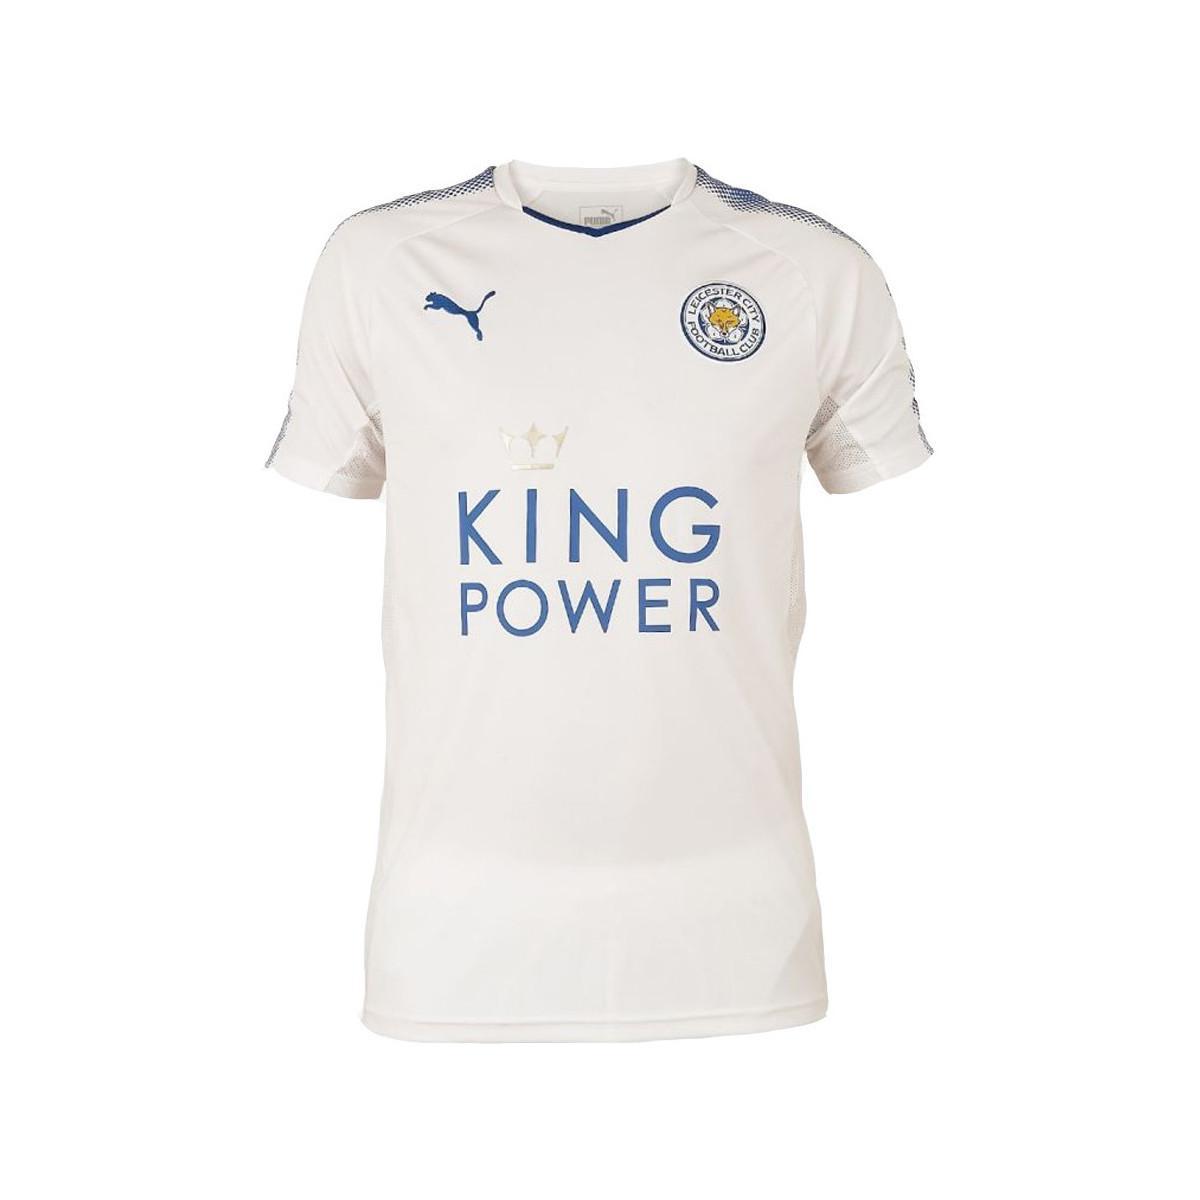 Puma 2017-18 Leicester City Third Shirt (maguire 15) Women s T Shirt ... fda88cb4d